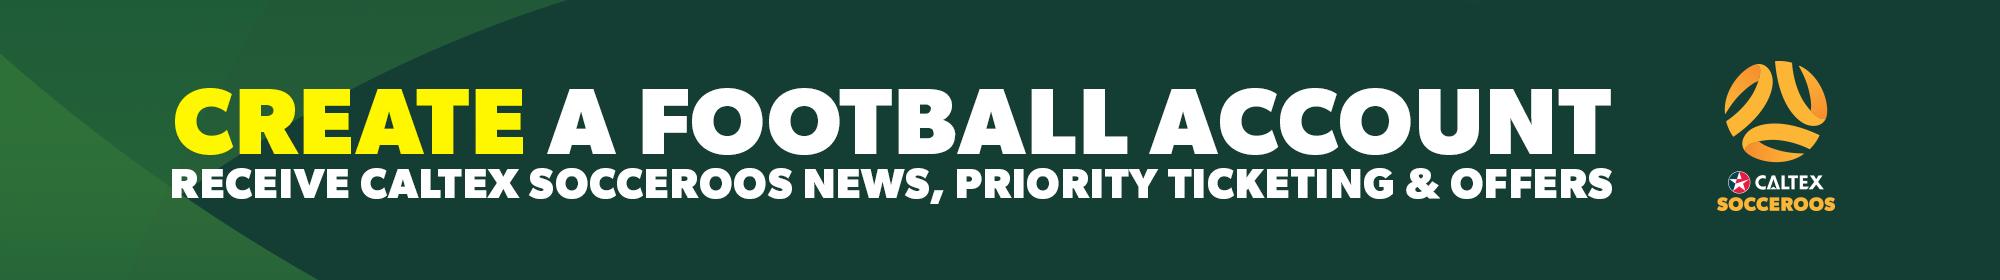 Create-Football-Account-Socceroos